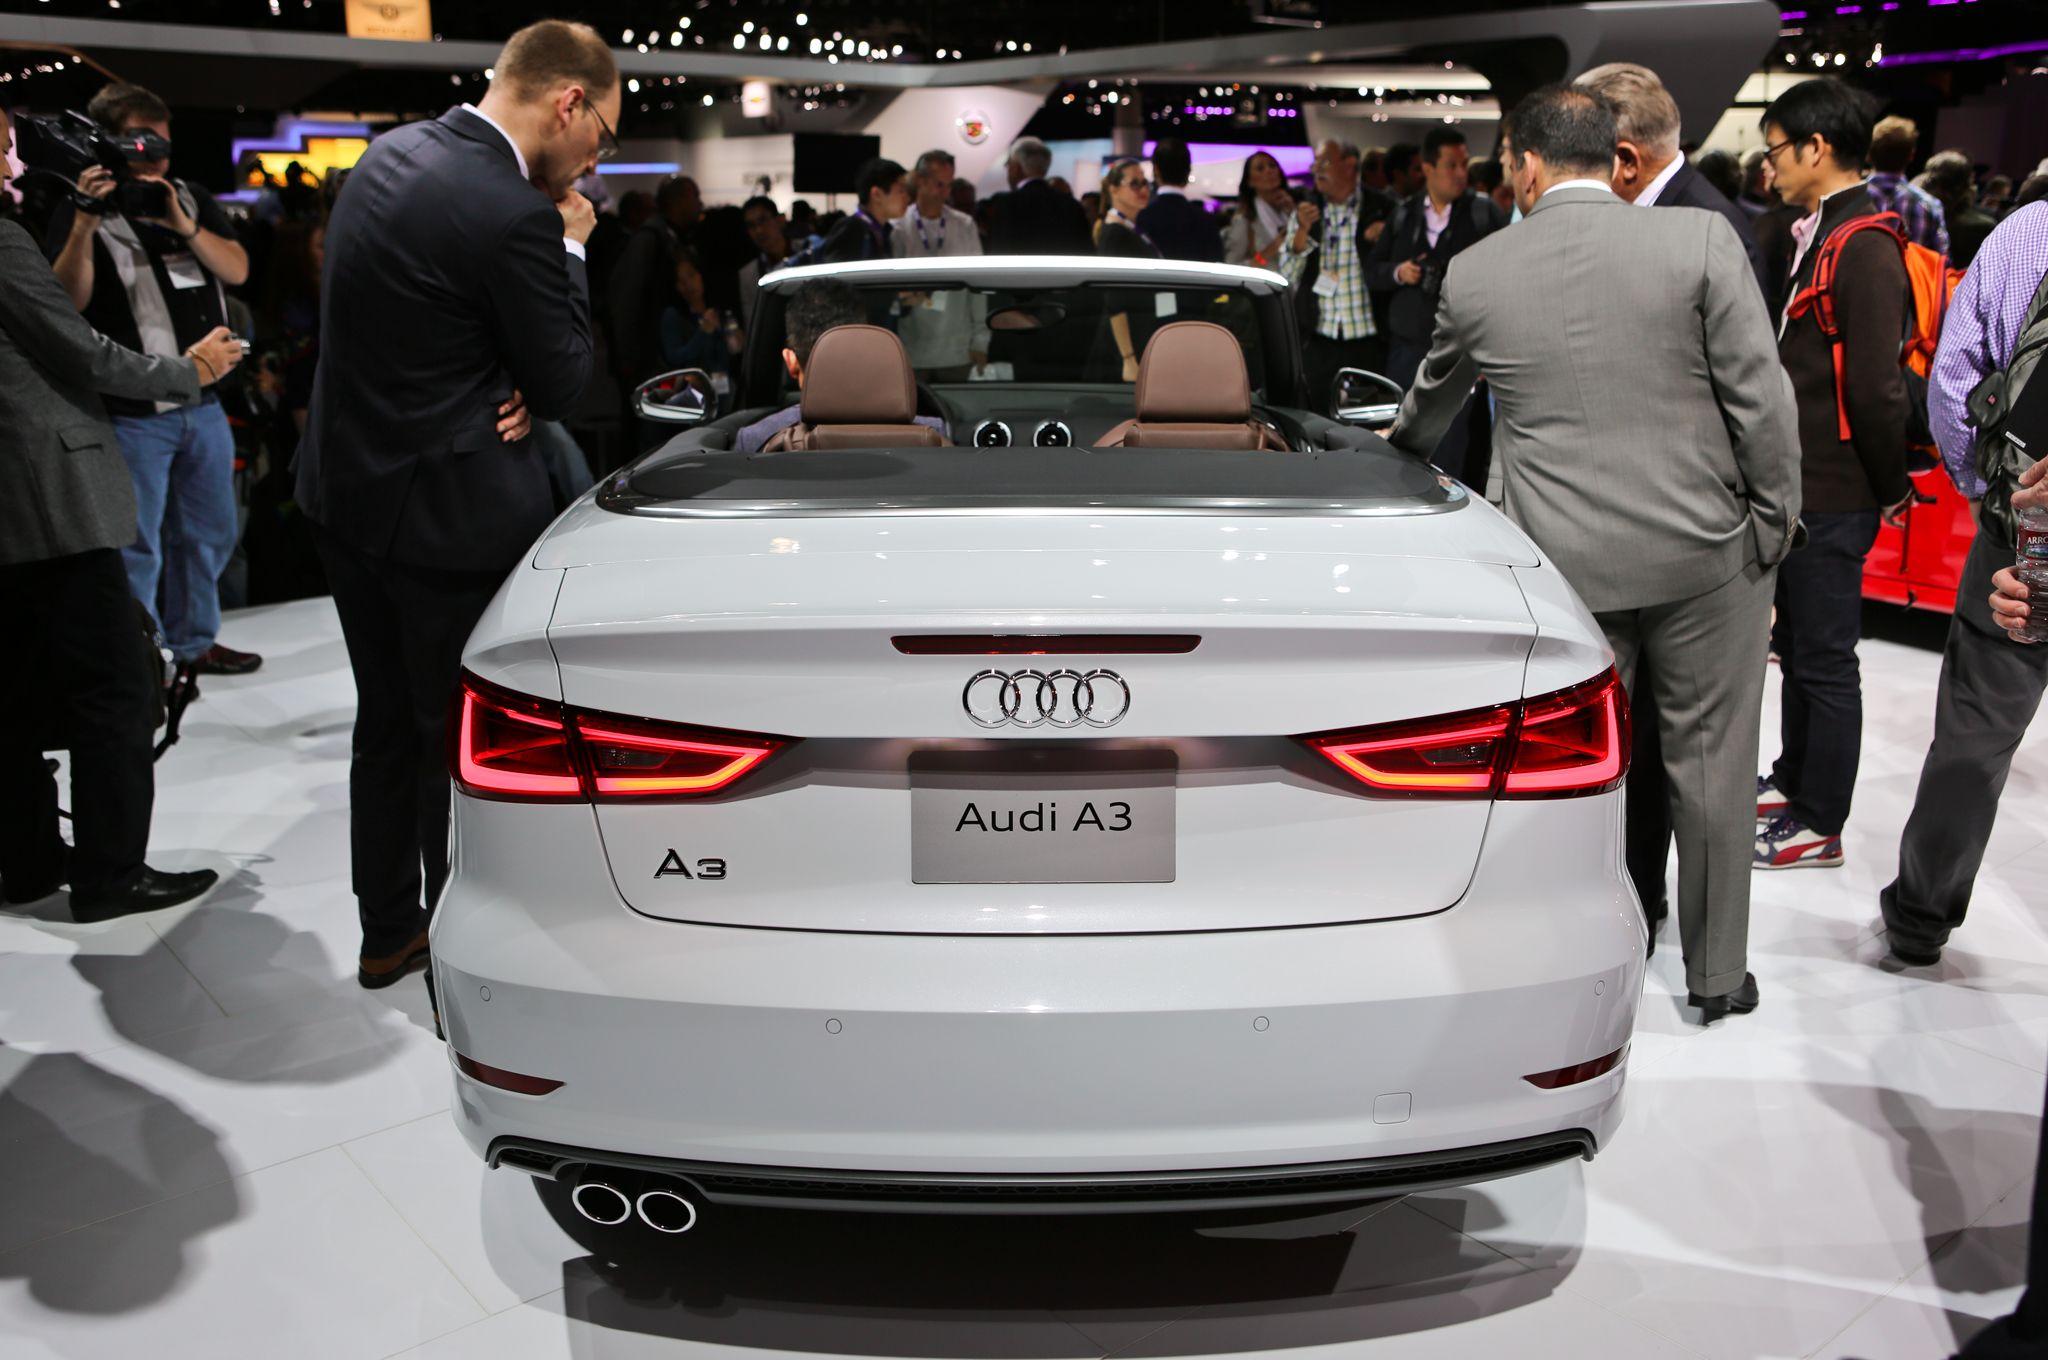 2015 audi a3 convertible 2015audia3sedan car autos review audi car2015 auto reviewsaudi a3cars autosedansconvertiblehtml